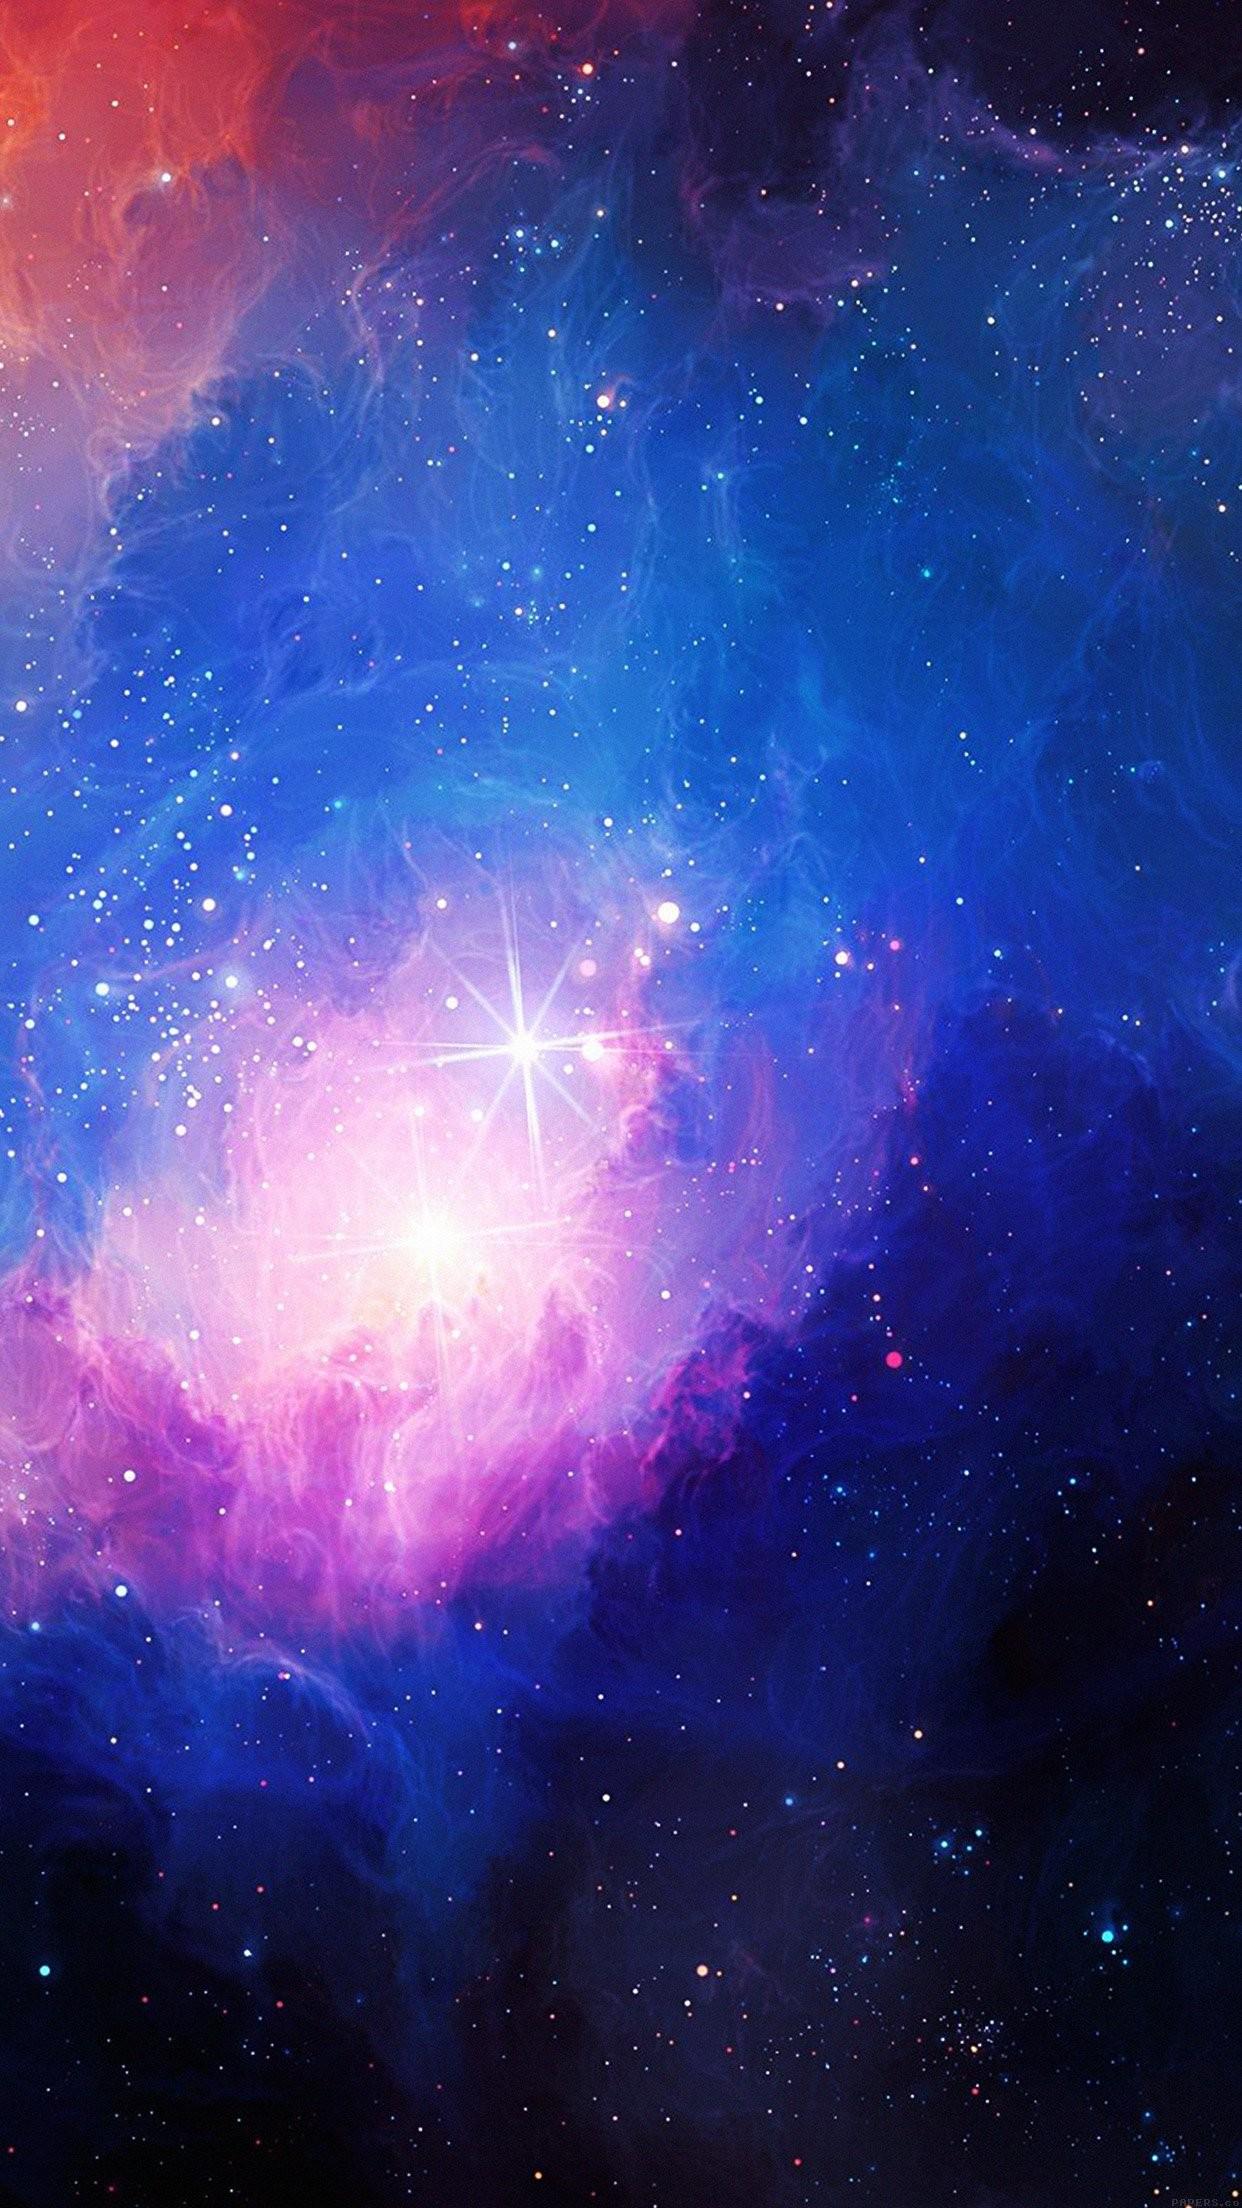 space-red-bigbang-star-art-nature-9-wallpaper